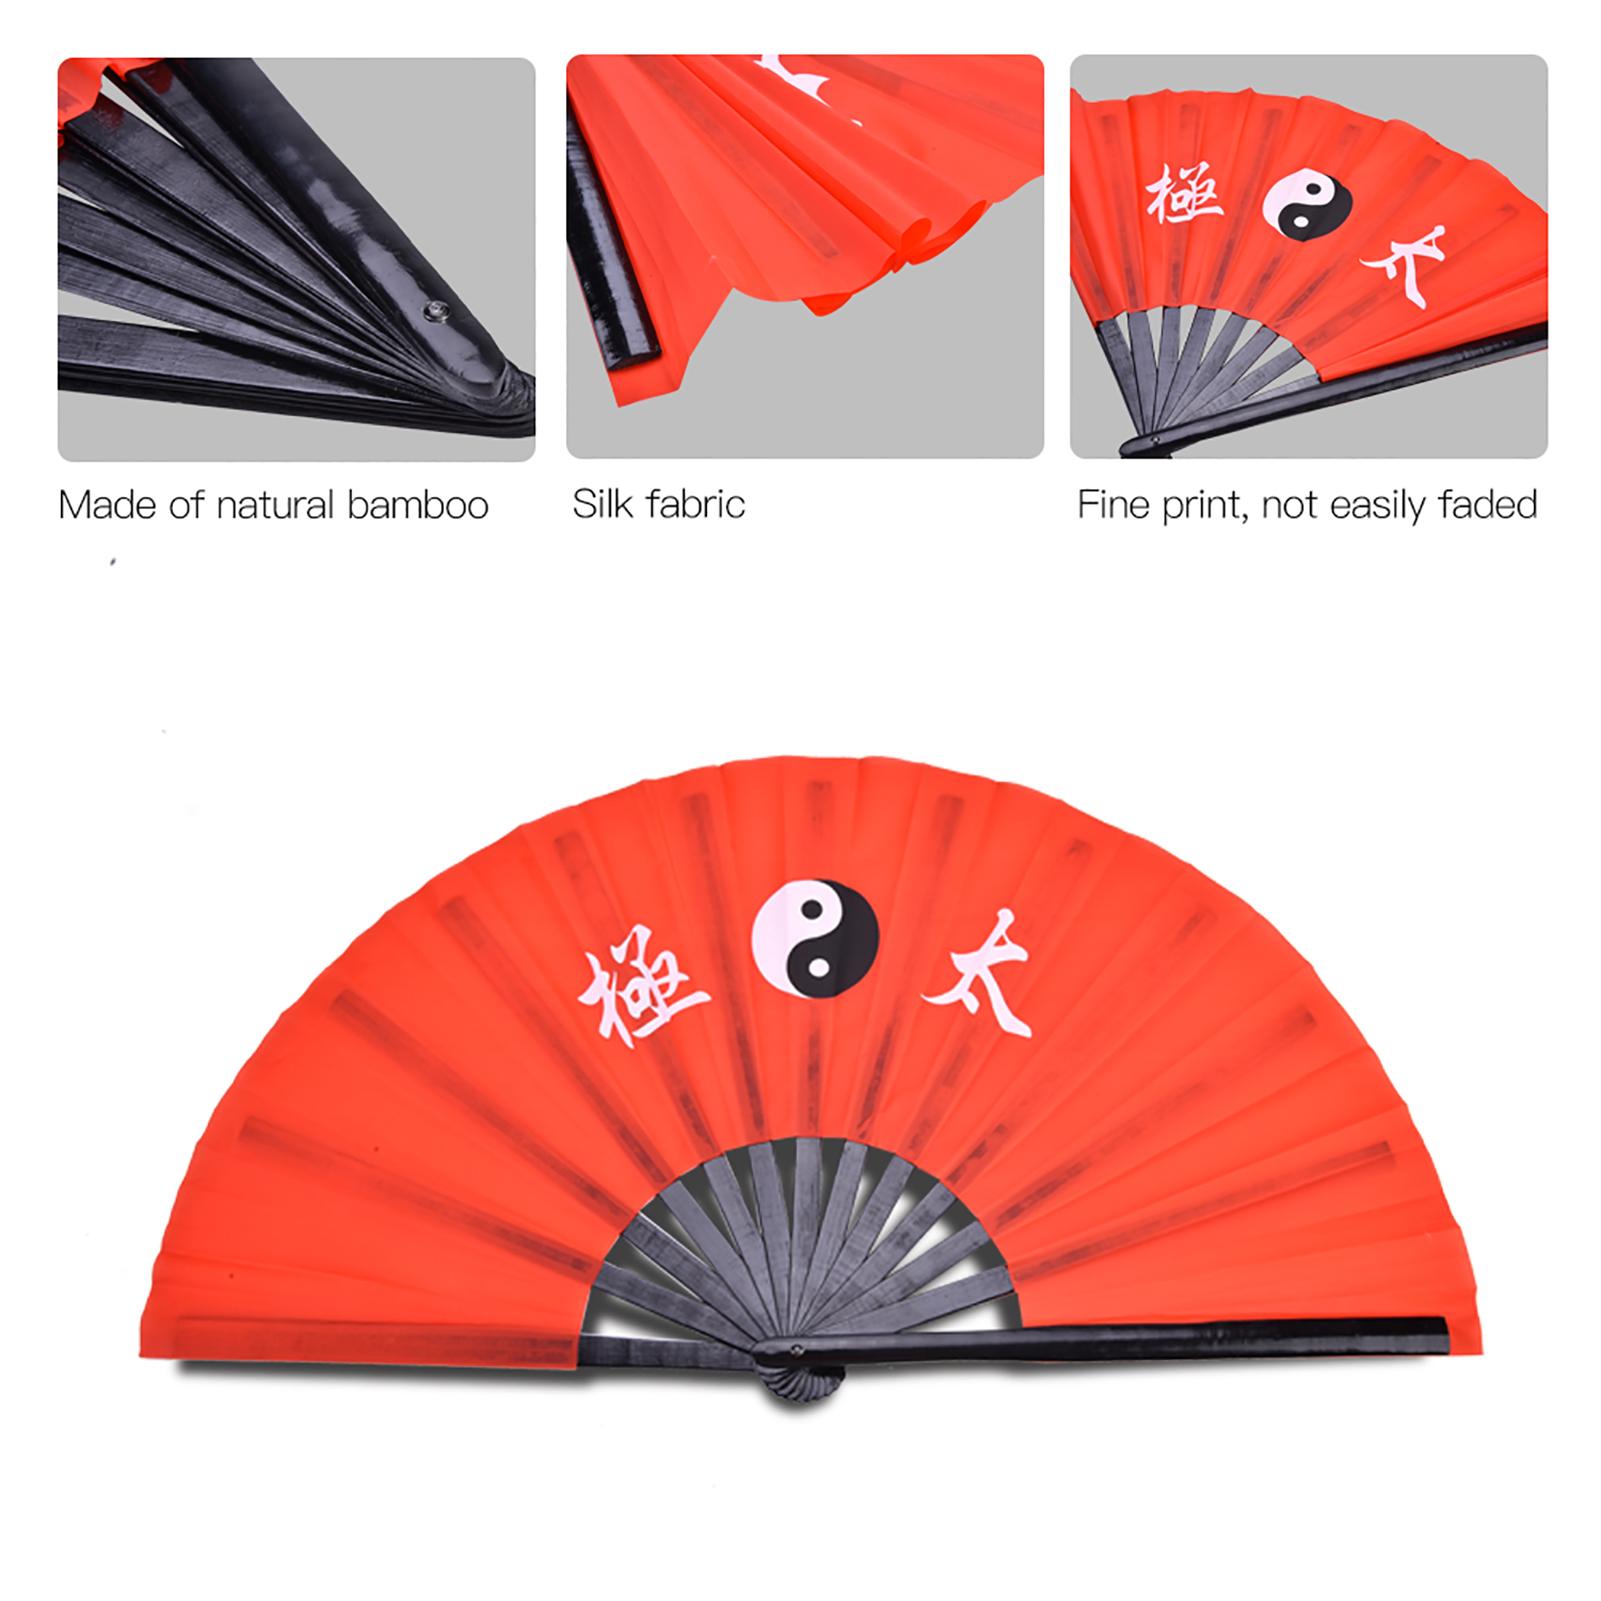 14-8-034-Tai-Chi-Martial-Arts-Kung-Fu-Bamboo-Fan-Red-Dance-Pratice-Folding-Peony-TD thumbnail 12